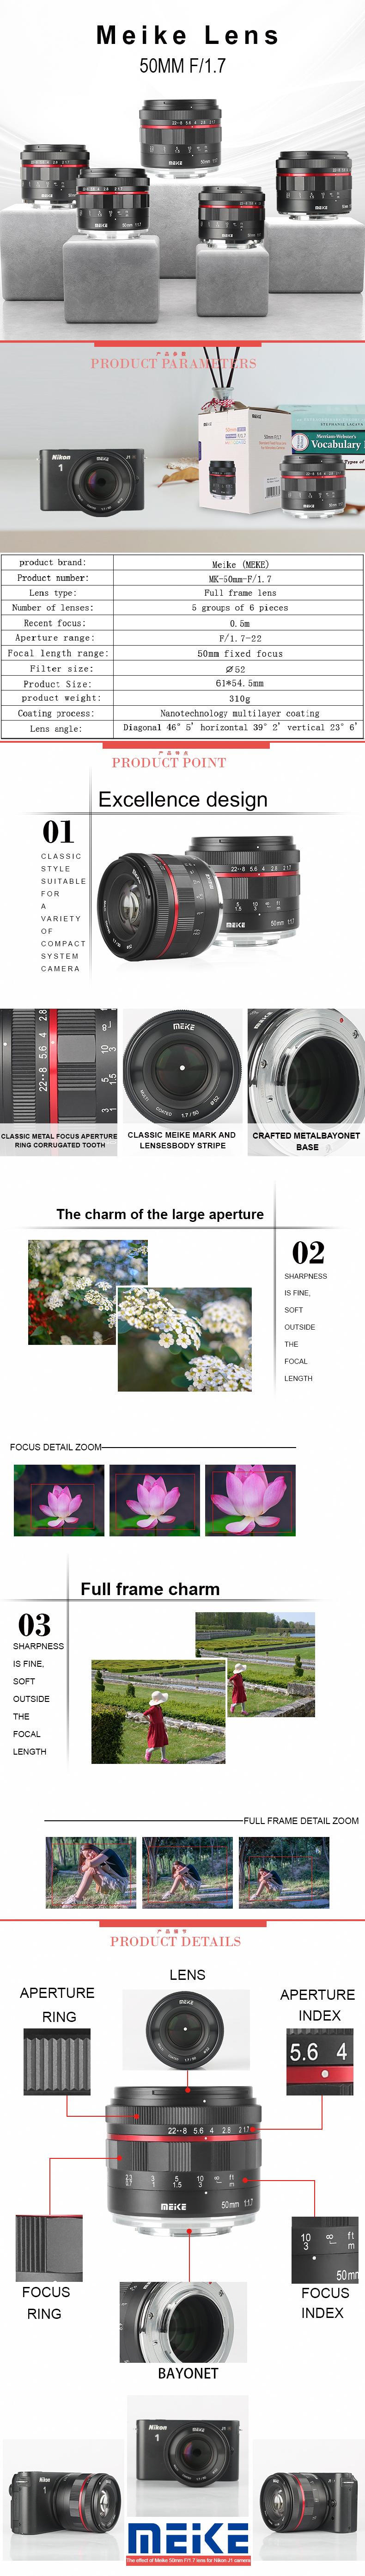 MEIKE MK-50MM F/1.7 Prime Lens for Fujifilm X mount